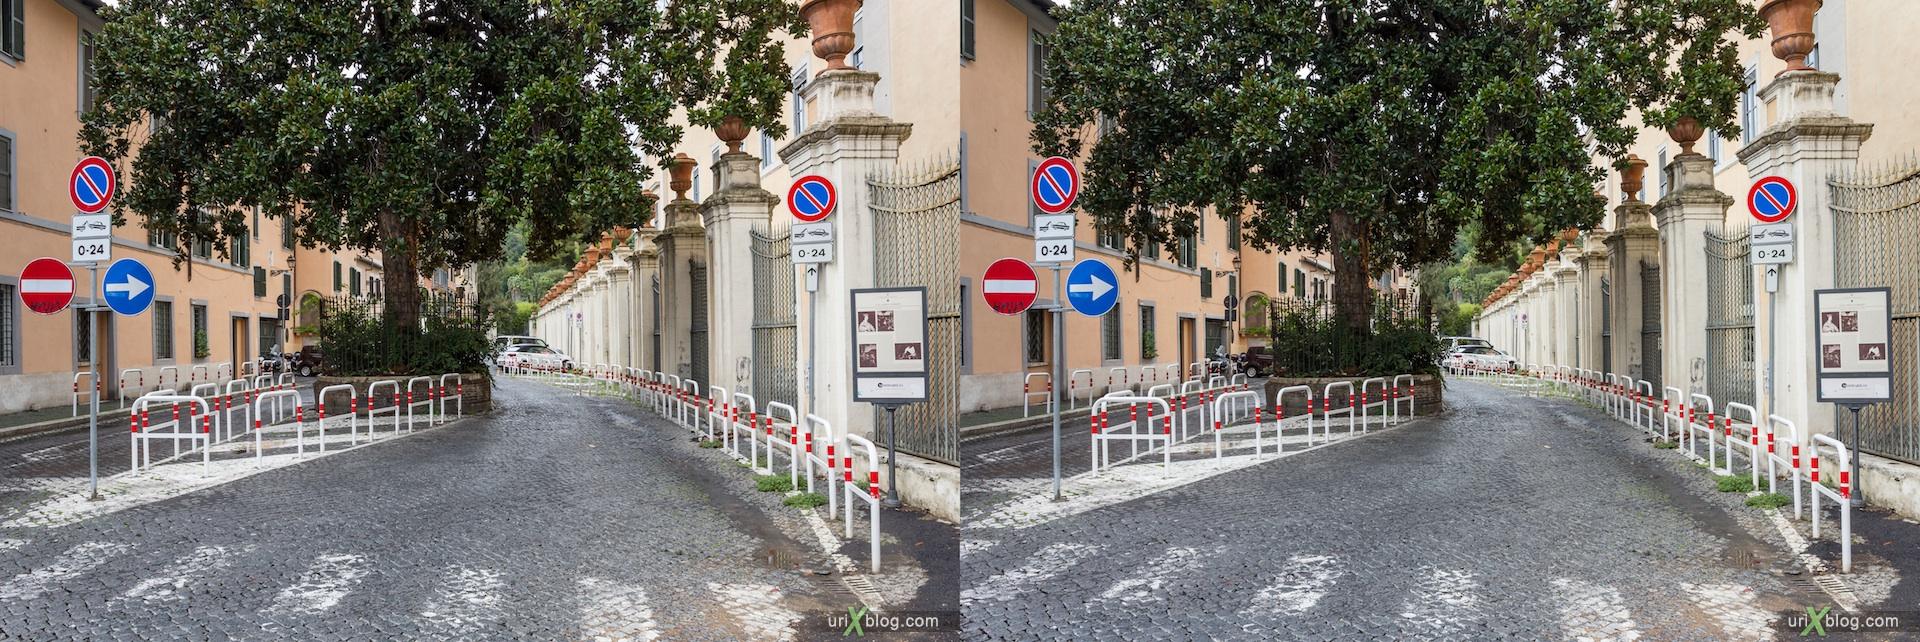 2012, Corsini street, della Lungara street, crosswalk, Rome, Italy, Europe, 3D, stereo pair, cross-eyed, crossview, cross view stereo pair